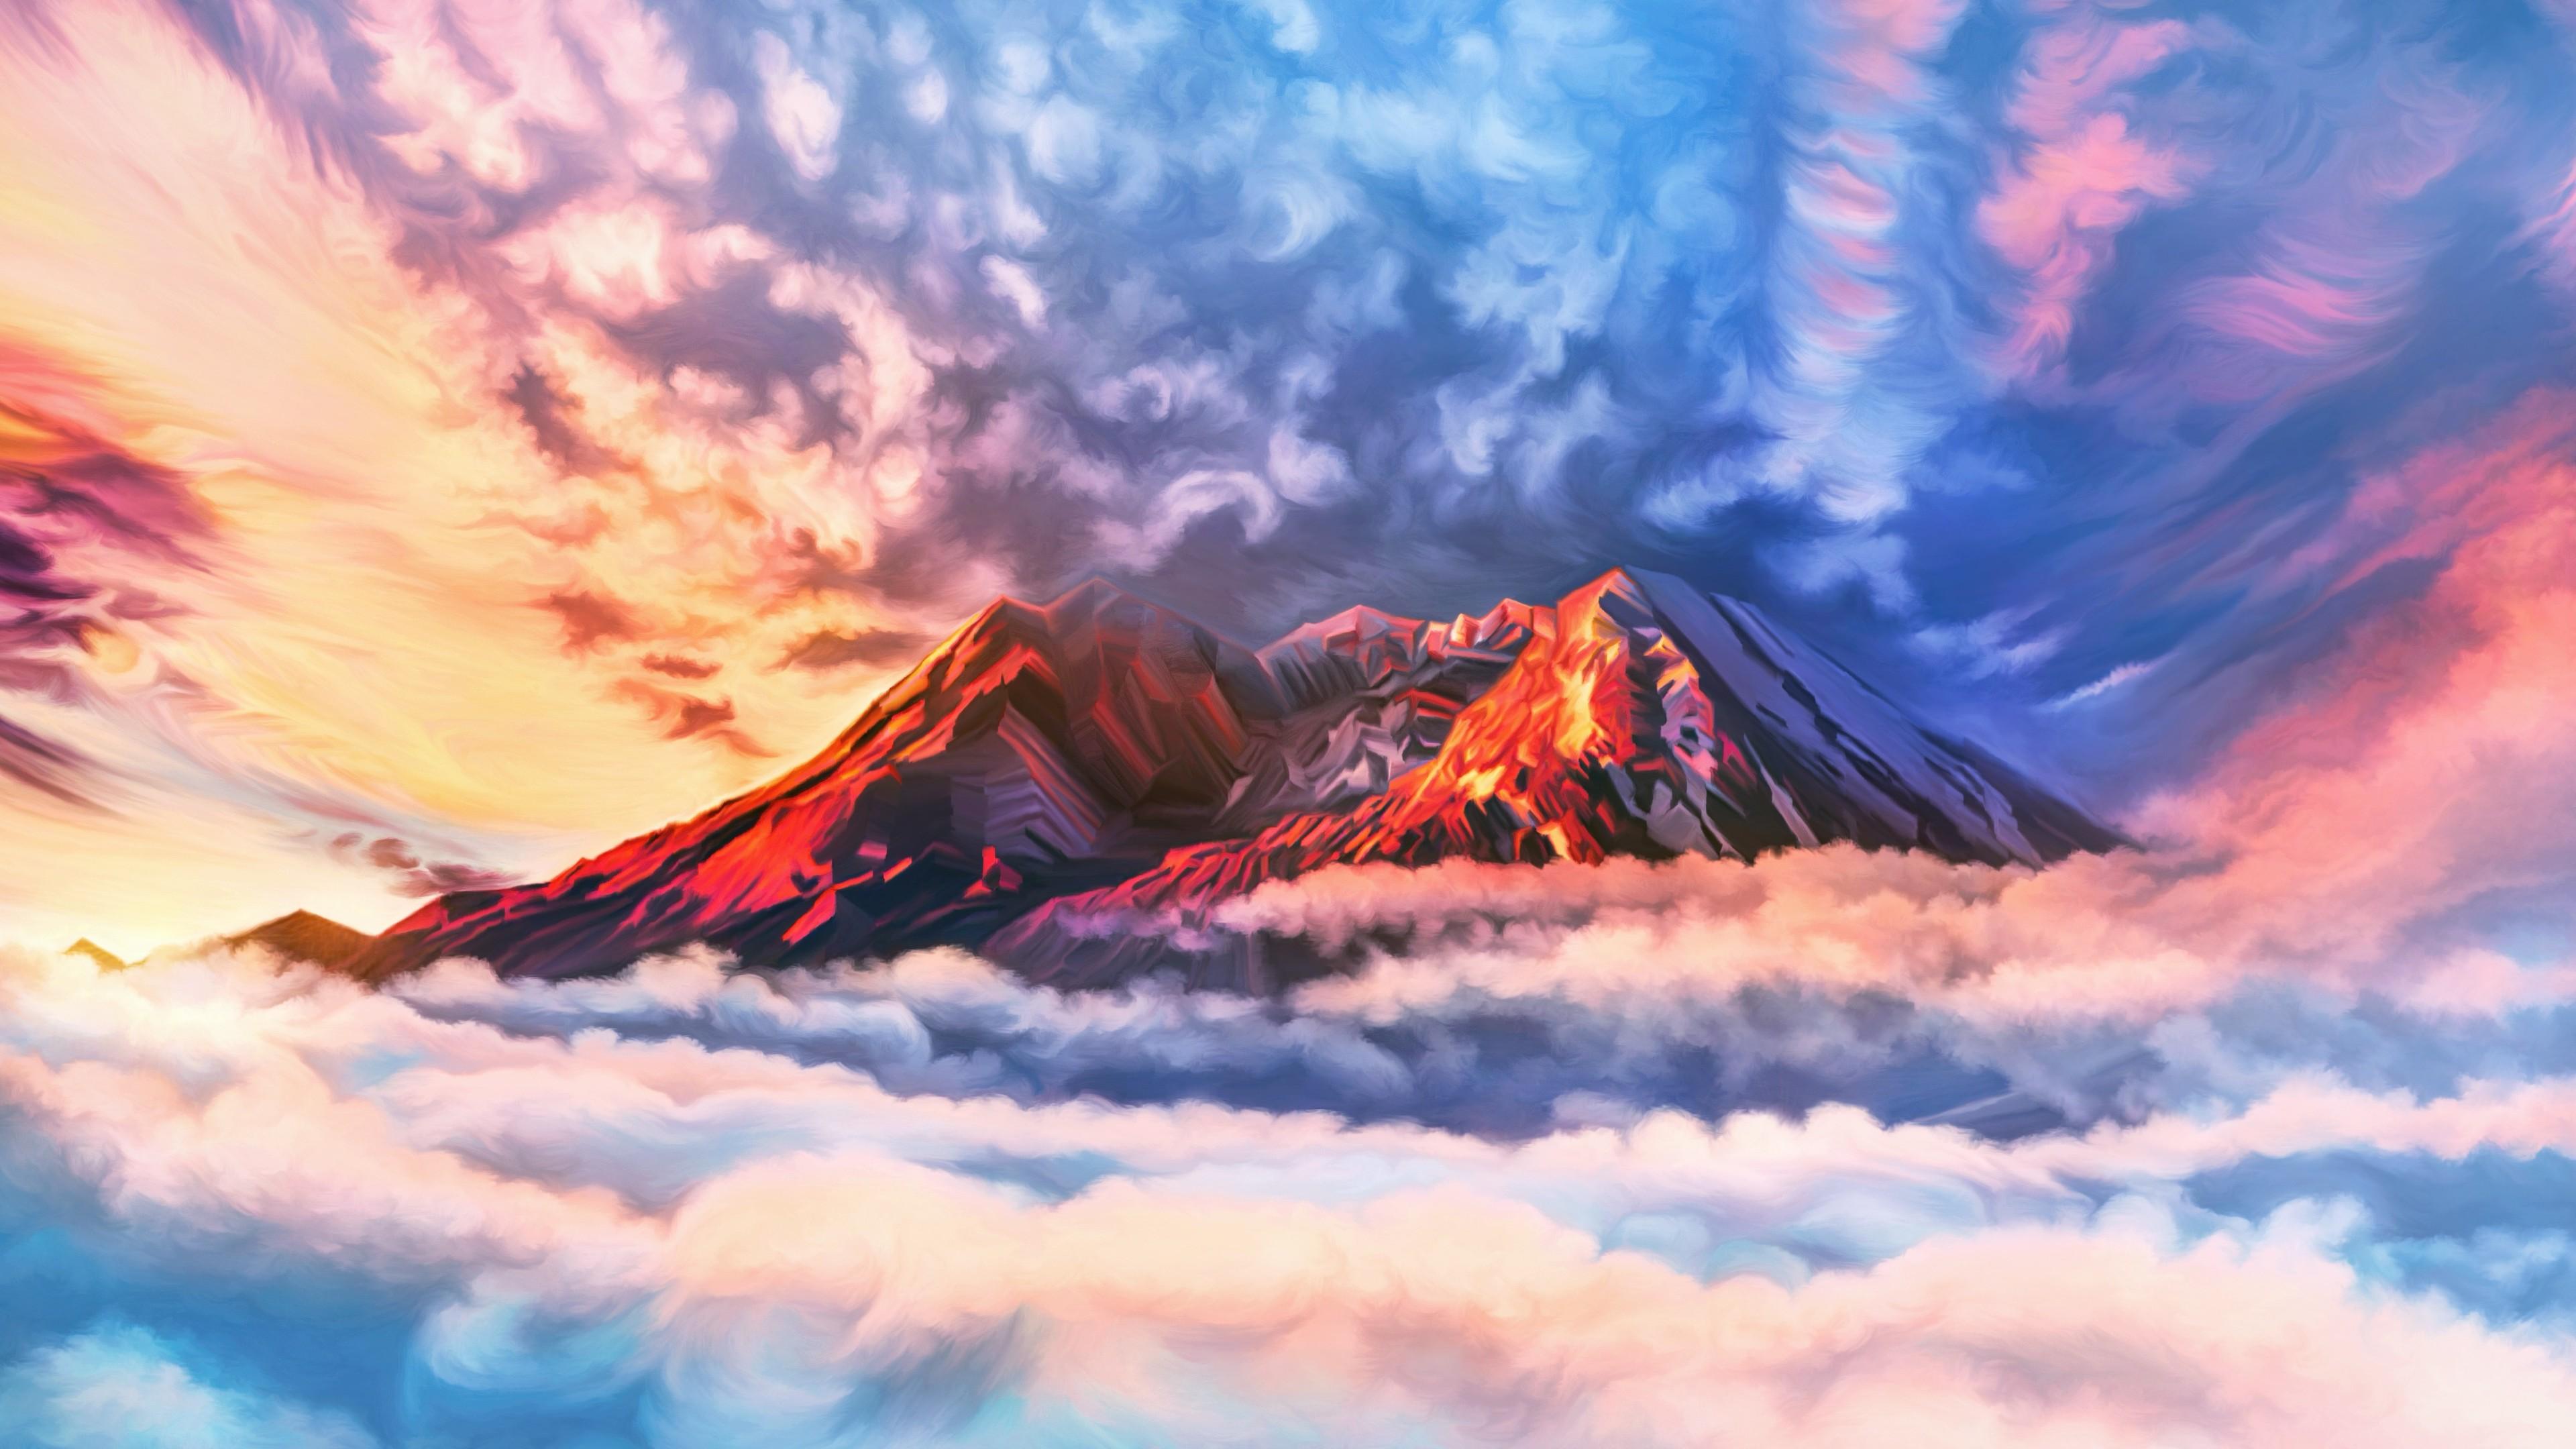 illustration artwork sky mountains clouds 4k 1540751137 - Illustration Artwork Sky Mountains Clouds 4k - sky wallpapers, mountains wallpapers, illustration wallpapers, hd-wallpapers, digital art wallpapers, clouds wallpapers, artwork wallpapers, artist wallpapers, 4k-wallpapers